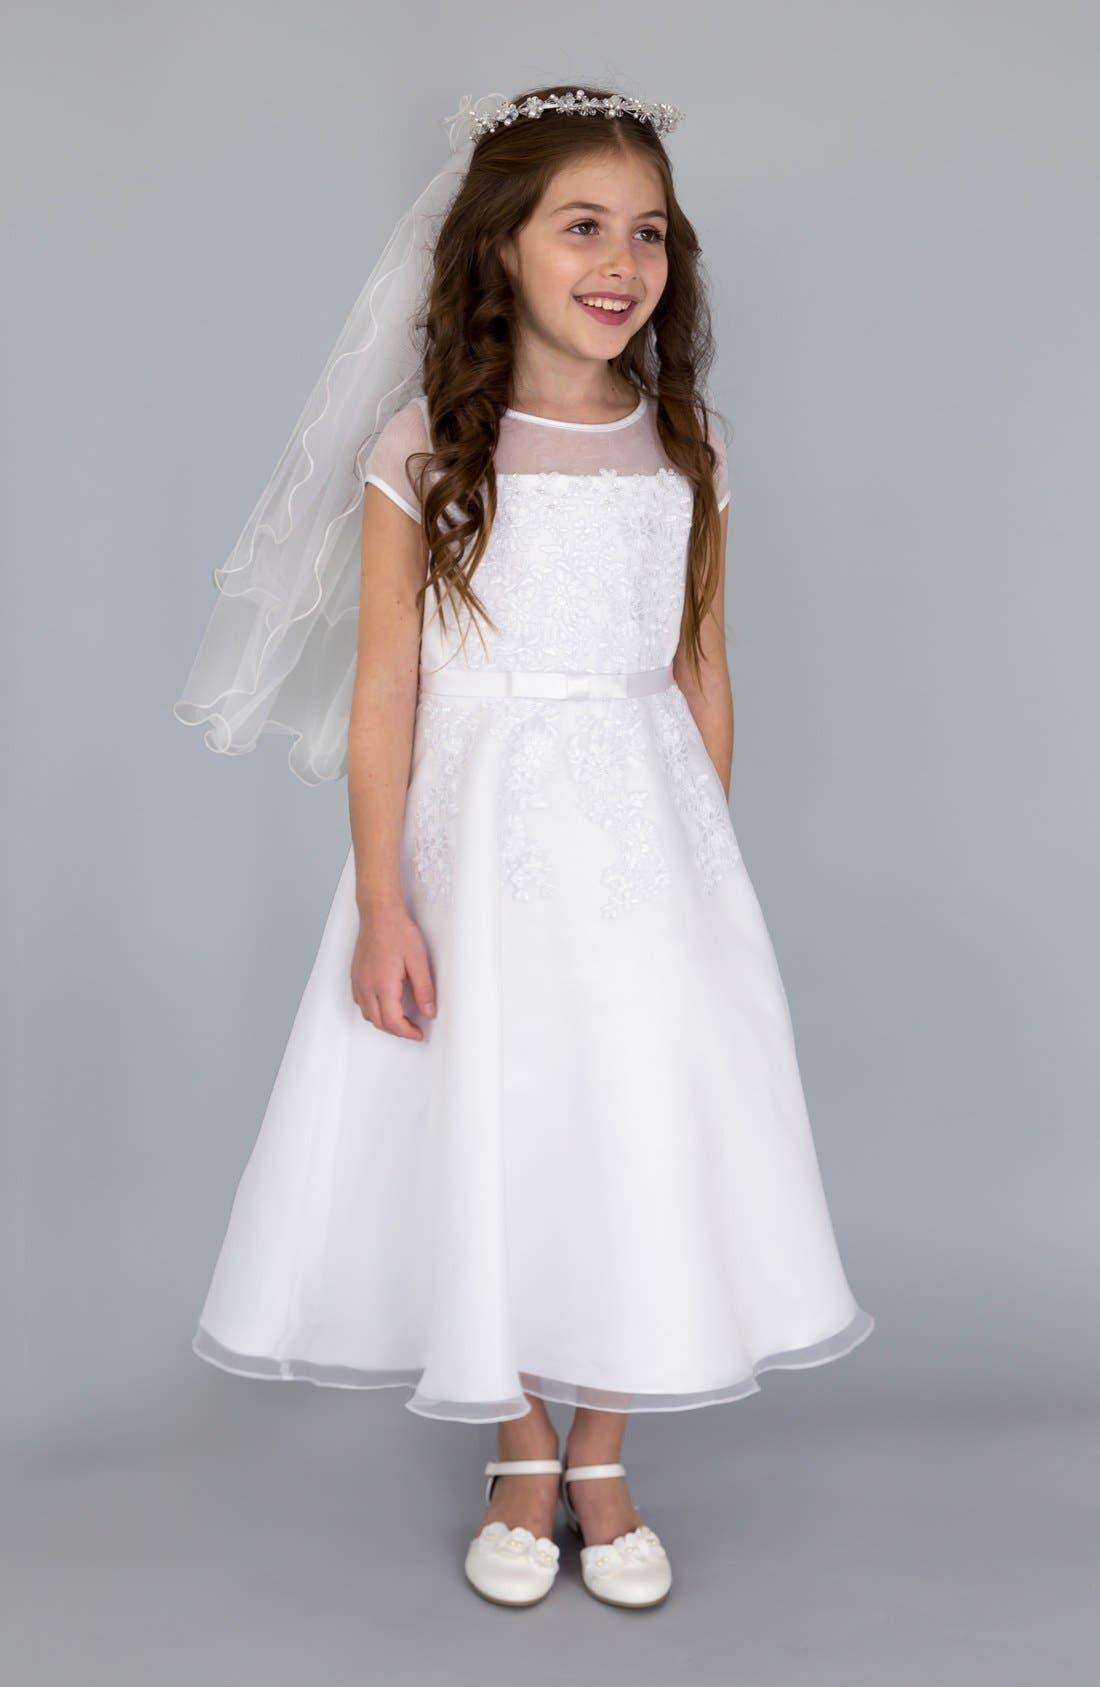 Old Fashioned Communion Dresses